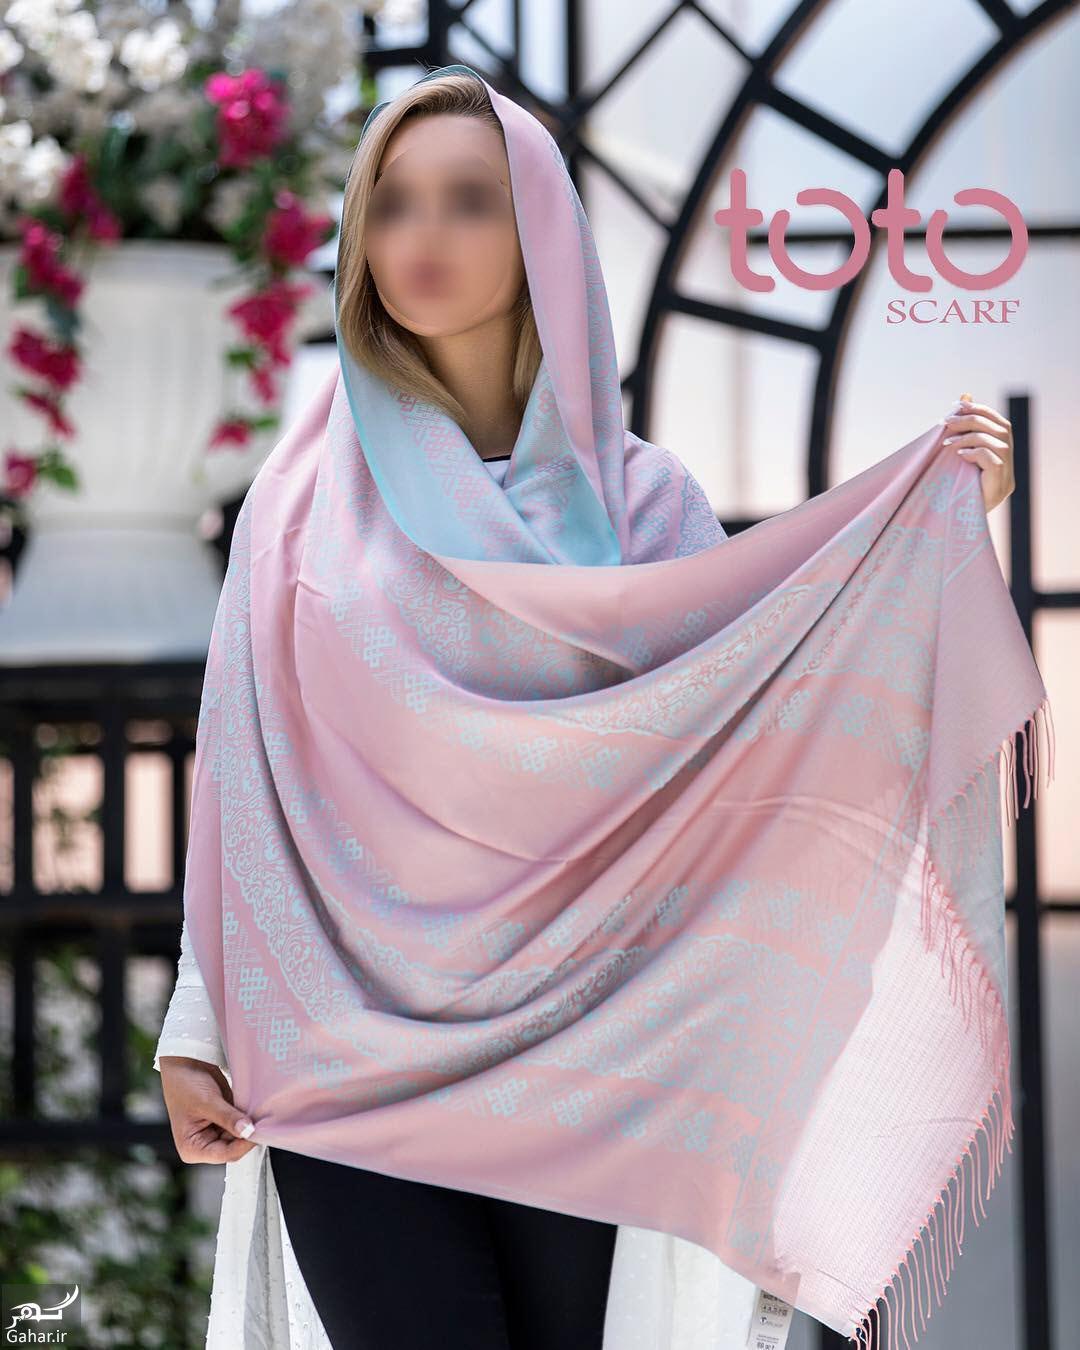 429854 Gahar ir جدیدترین مدل های شال و روسری از برند ایرانی توتو